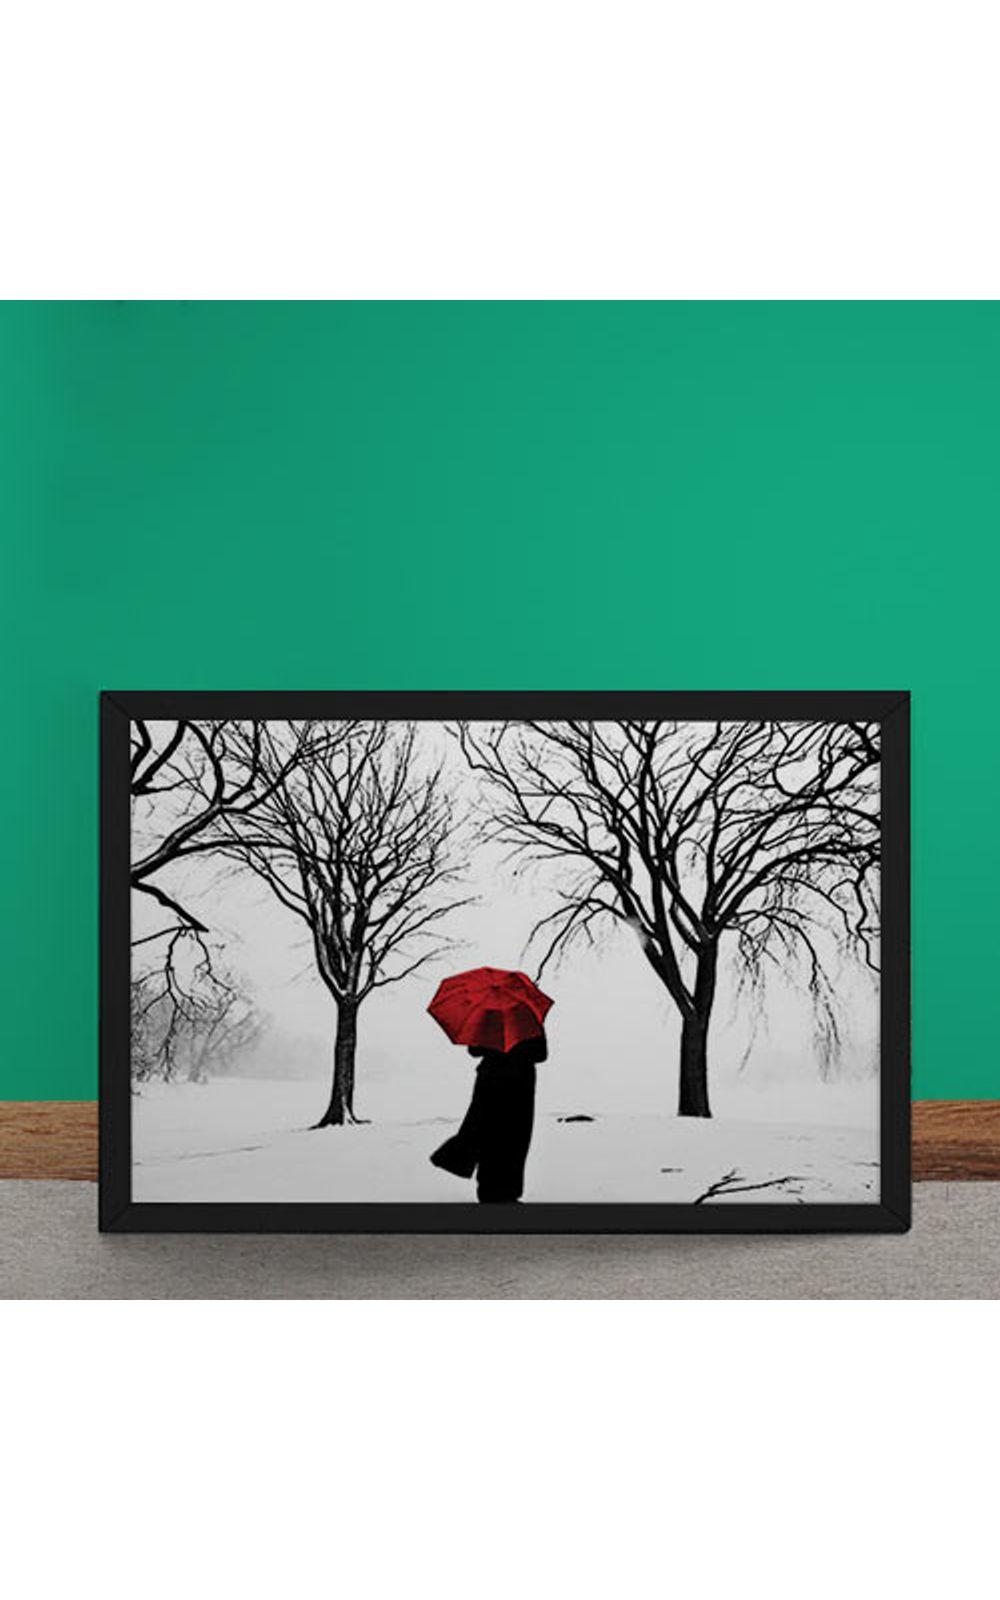 Foto 2 - Quadro Decorativo Guarda Chuva Vermelho na Neve